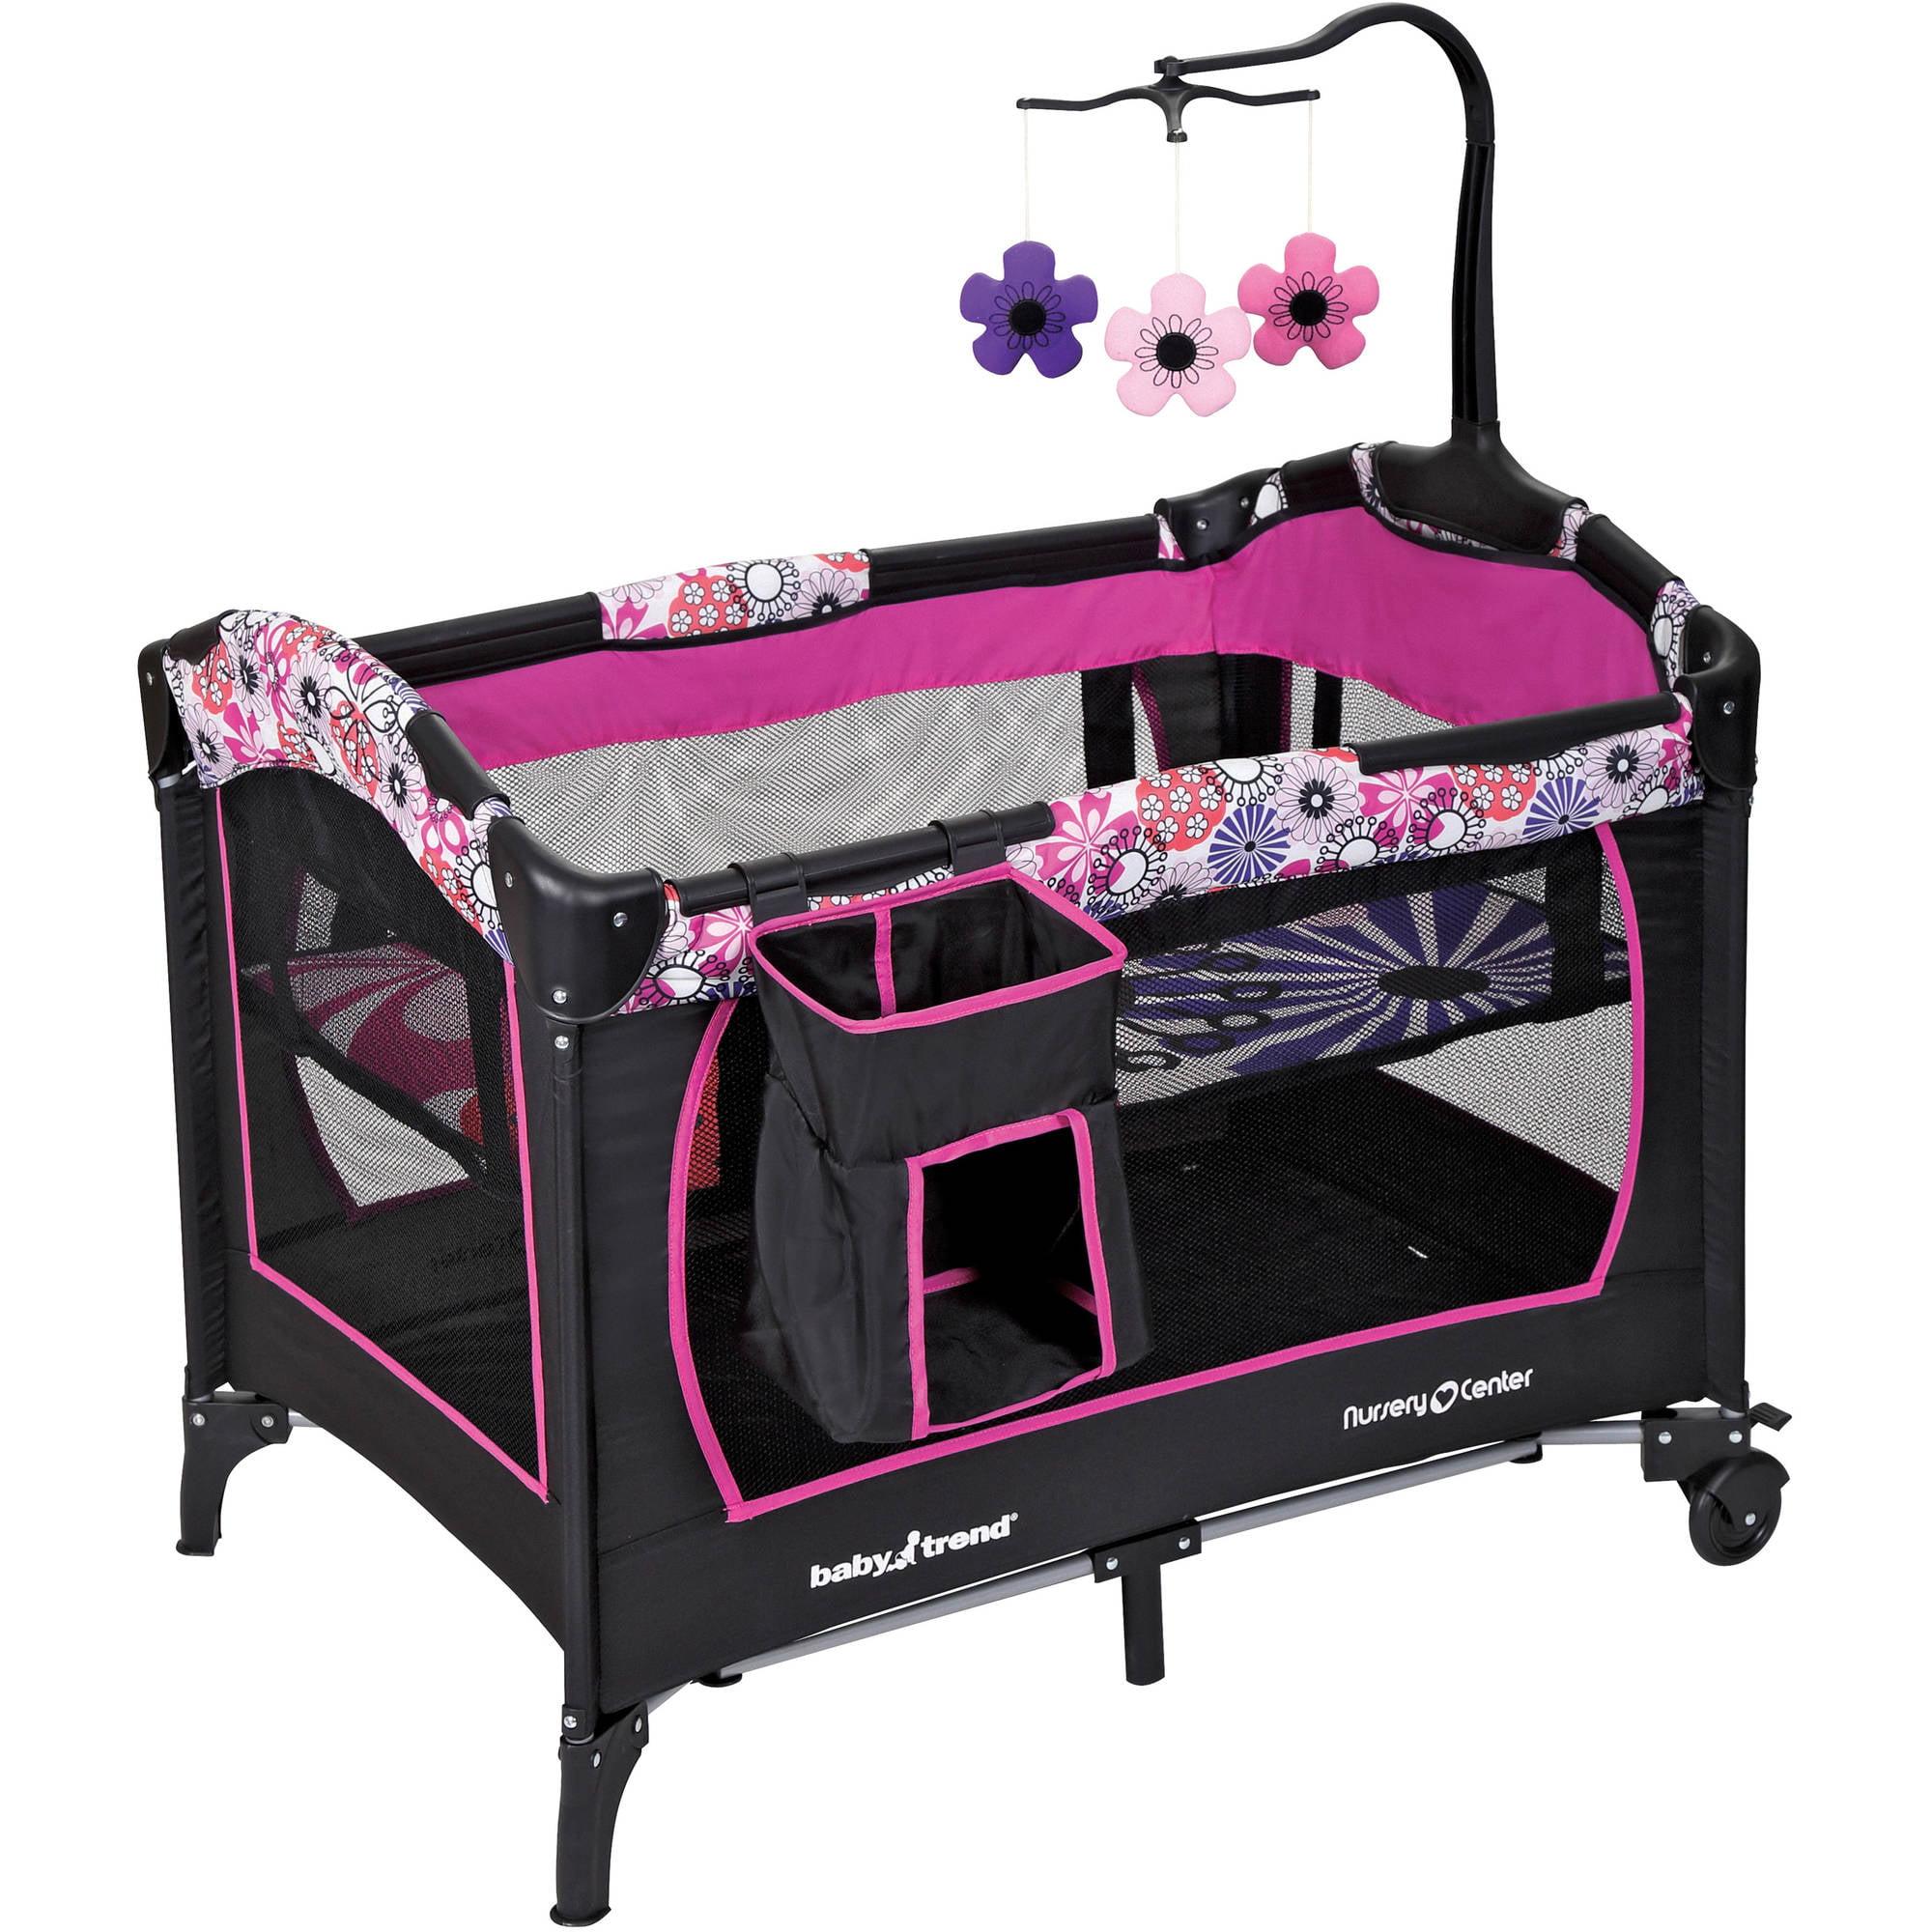 Baby Trend Nursery Center Playard Floral Garden Walmart Com